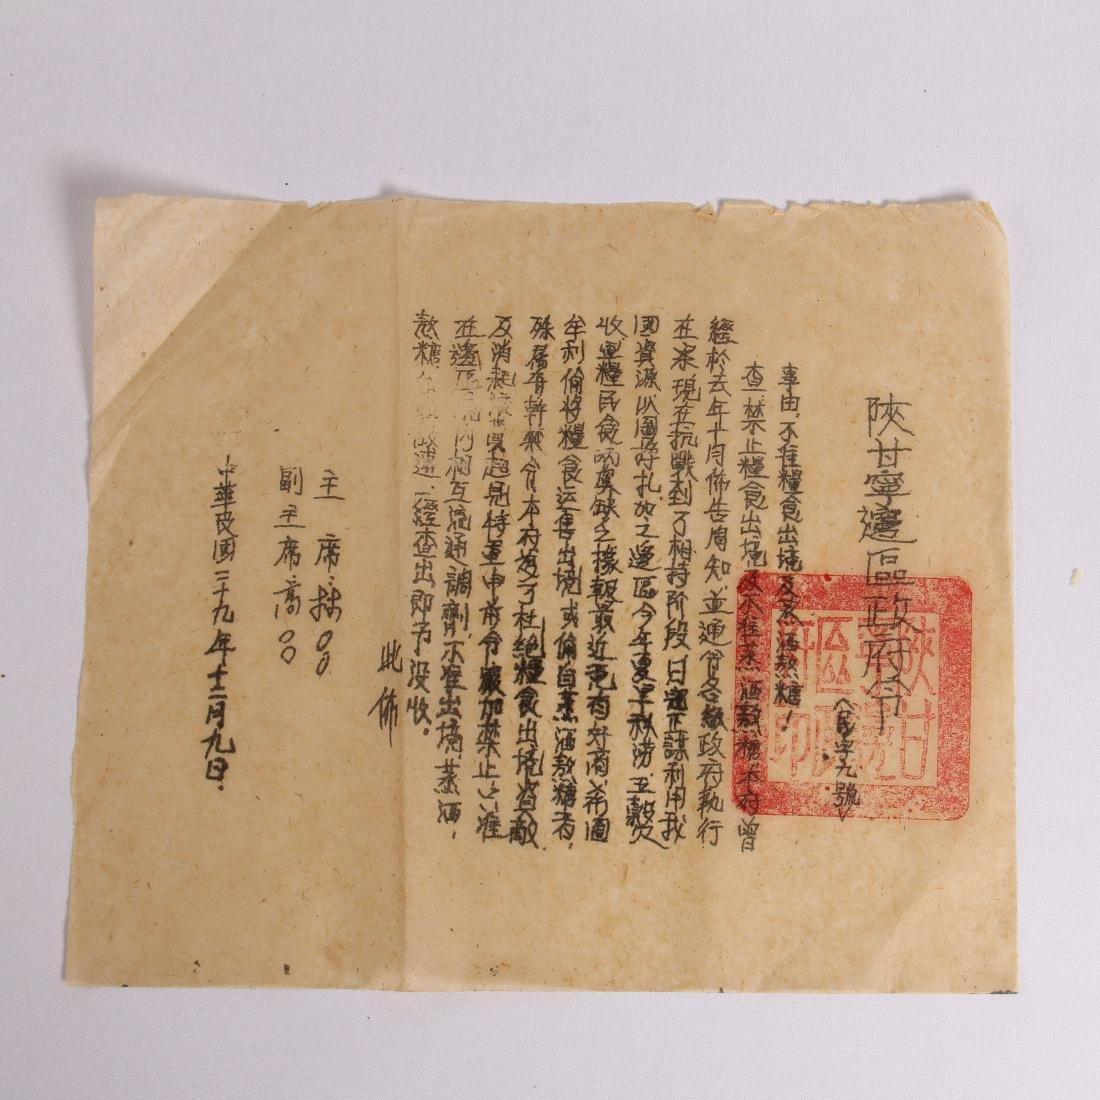 CHINESE SOVIET CHAIRMAN ORDER PRINT 1930S